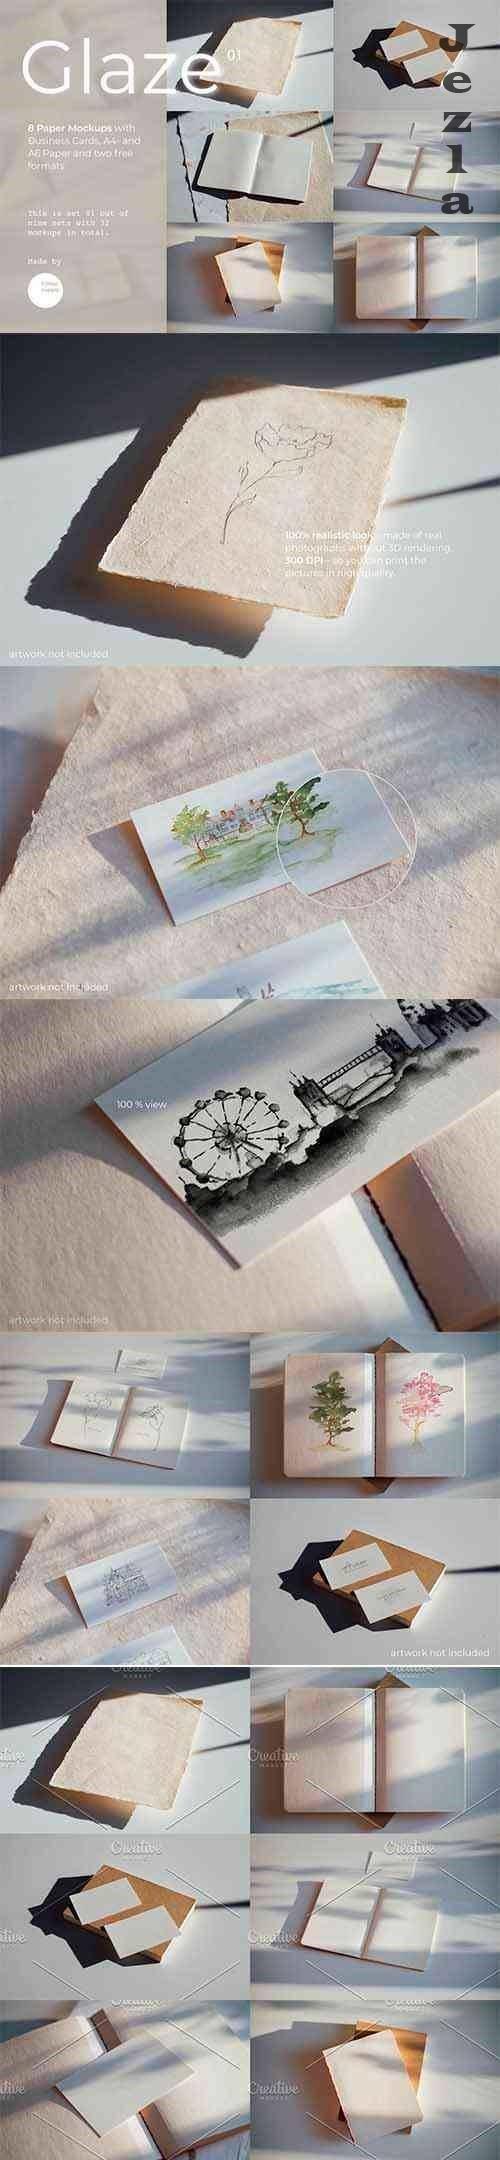 CreativeMarket - Glaze Paper Mockups Set 01 5000601